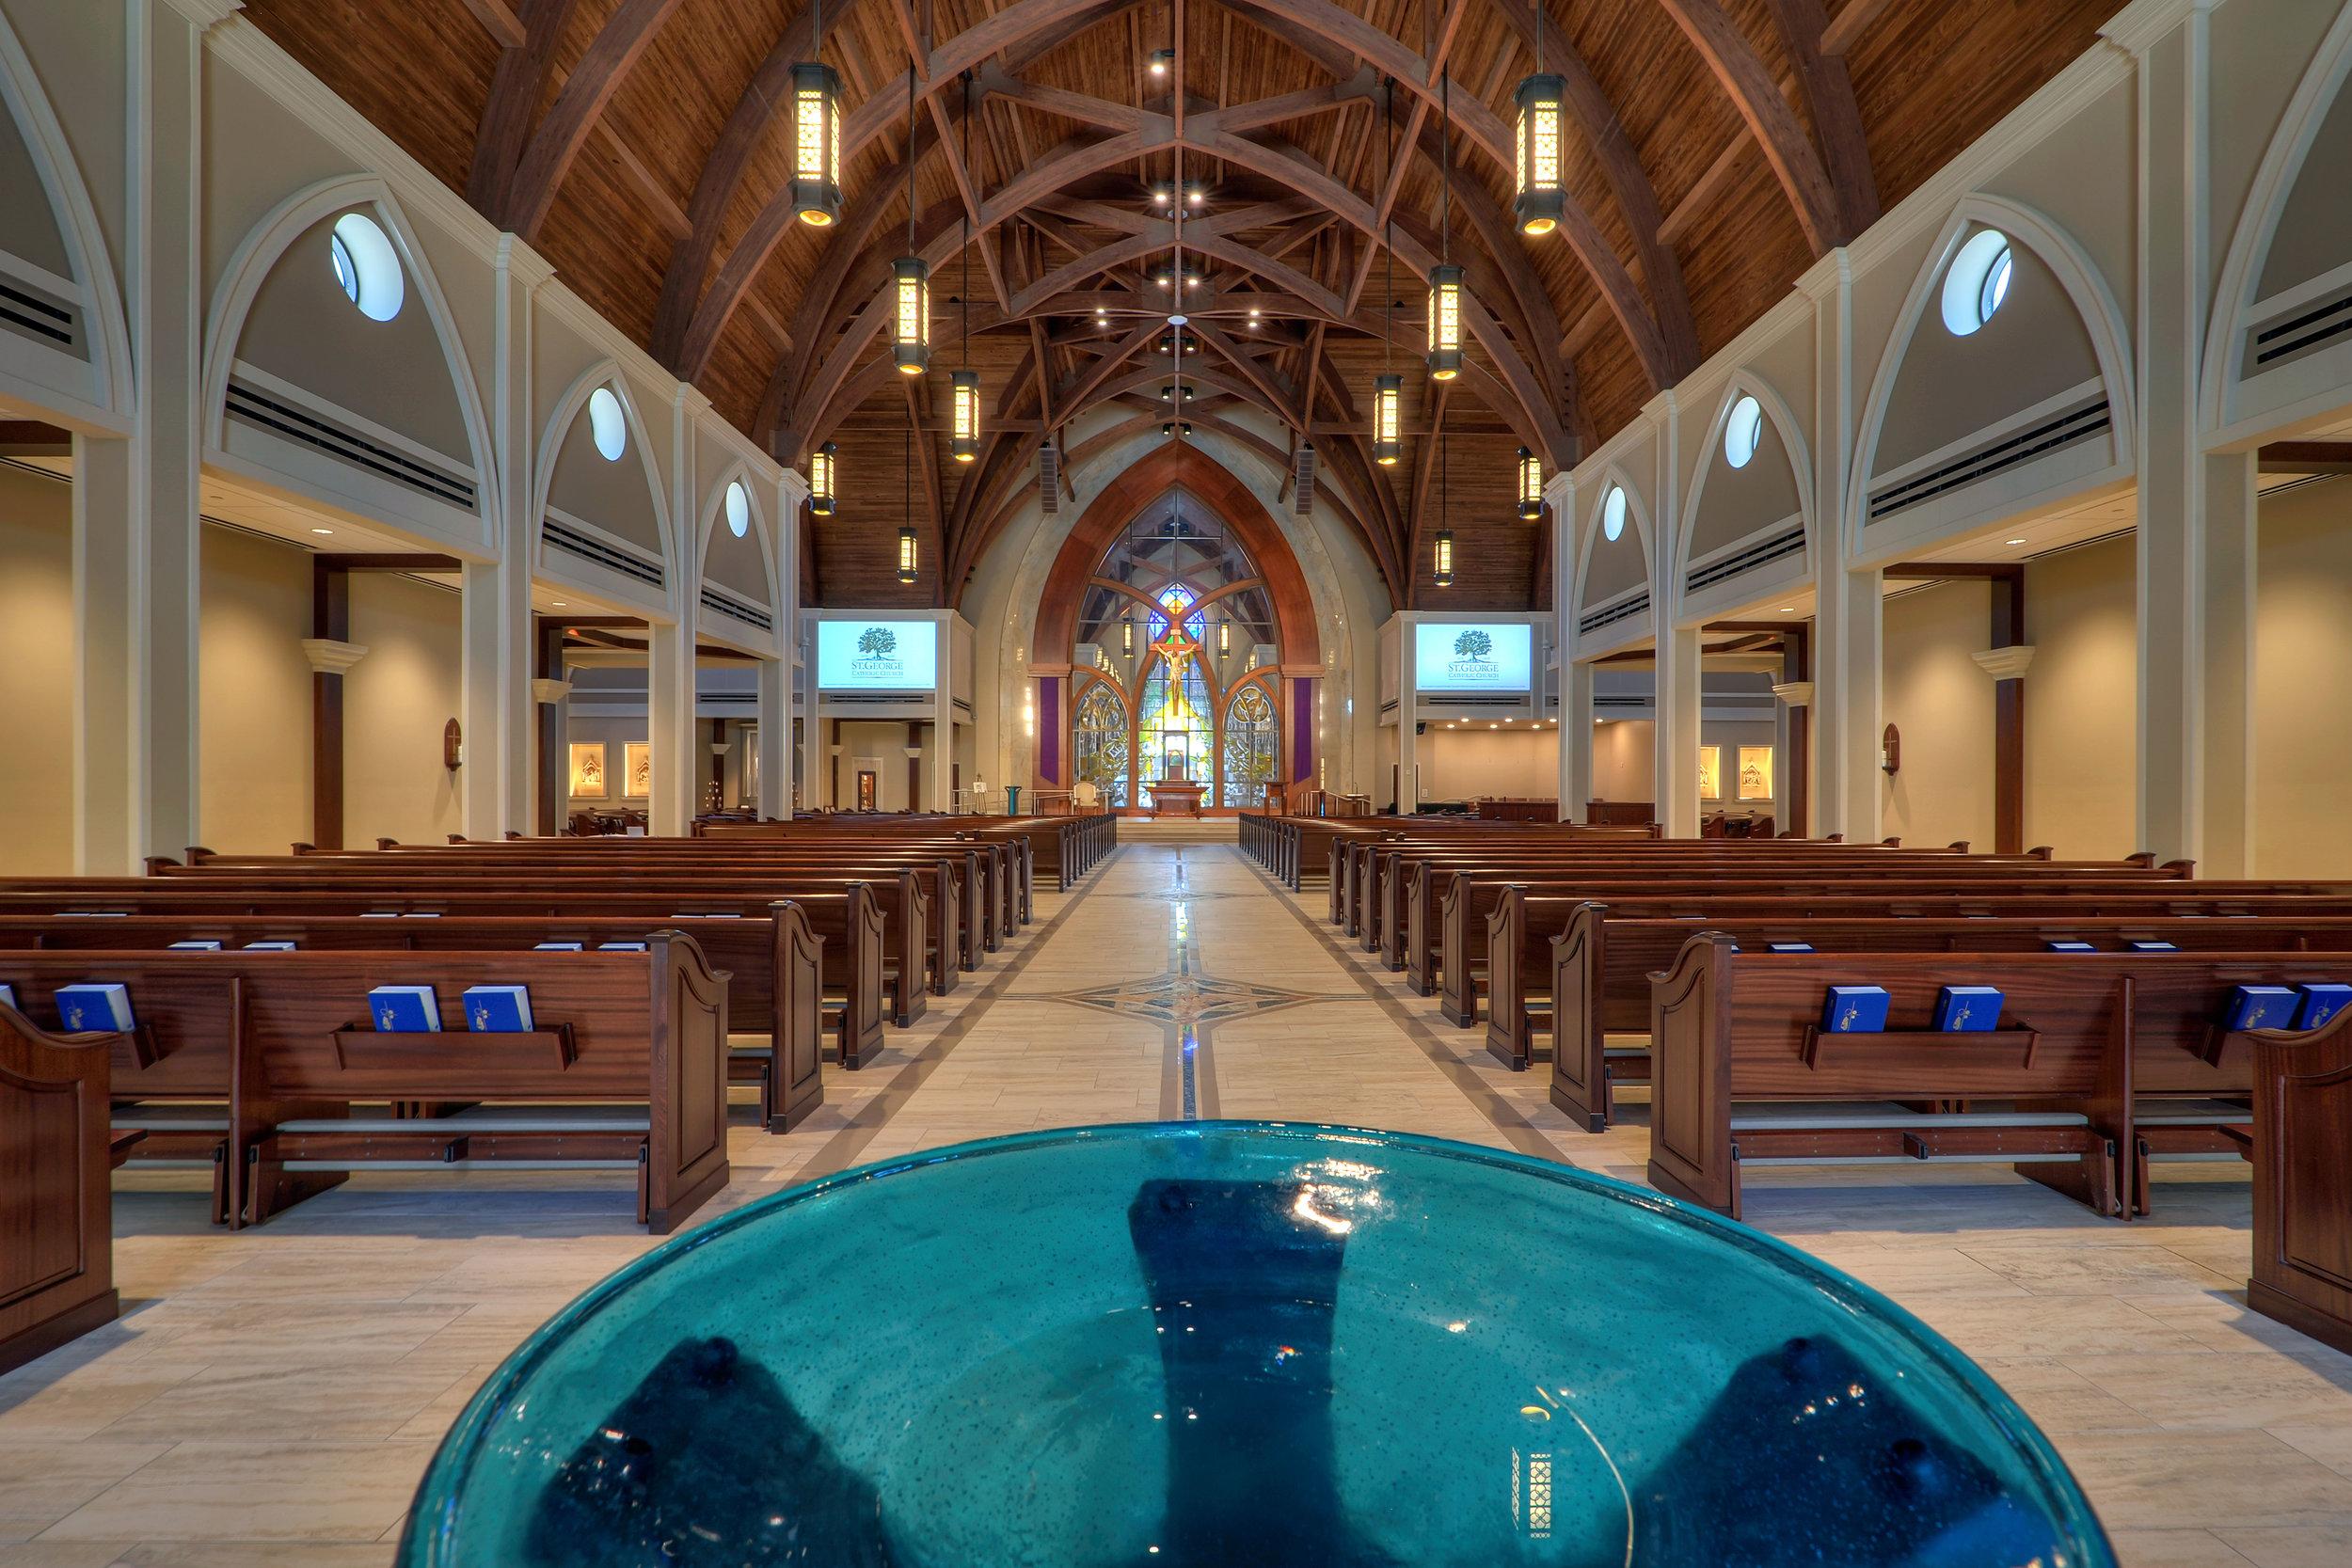 St George Catholic Church 3.jpg